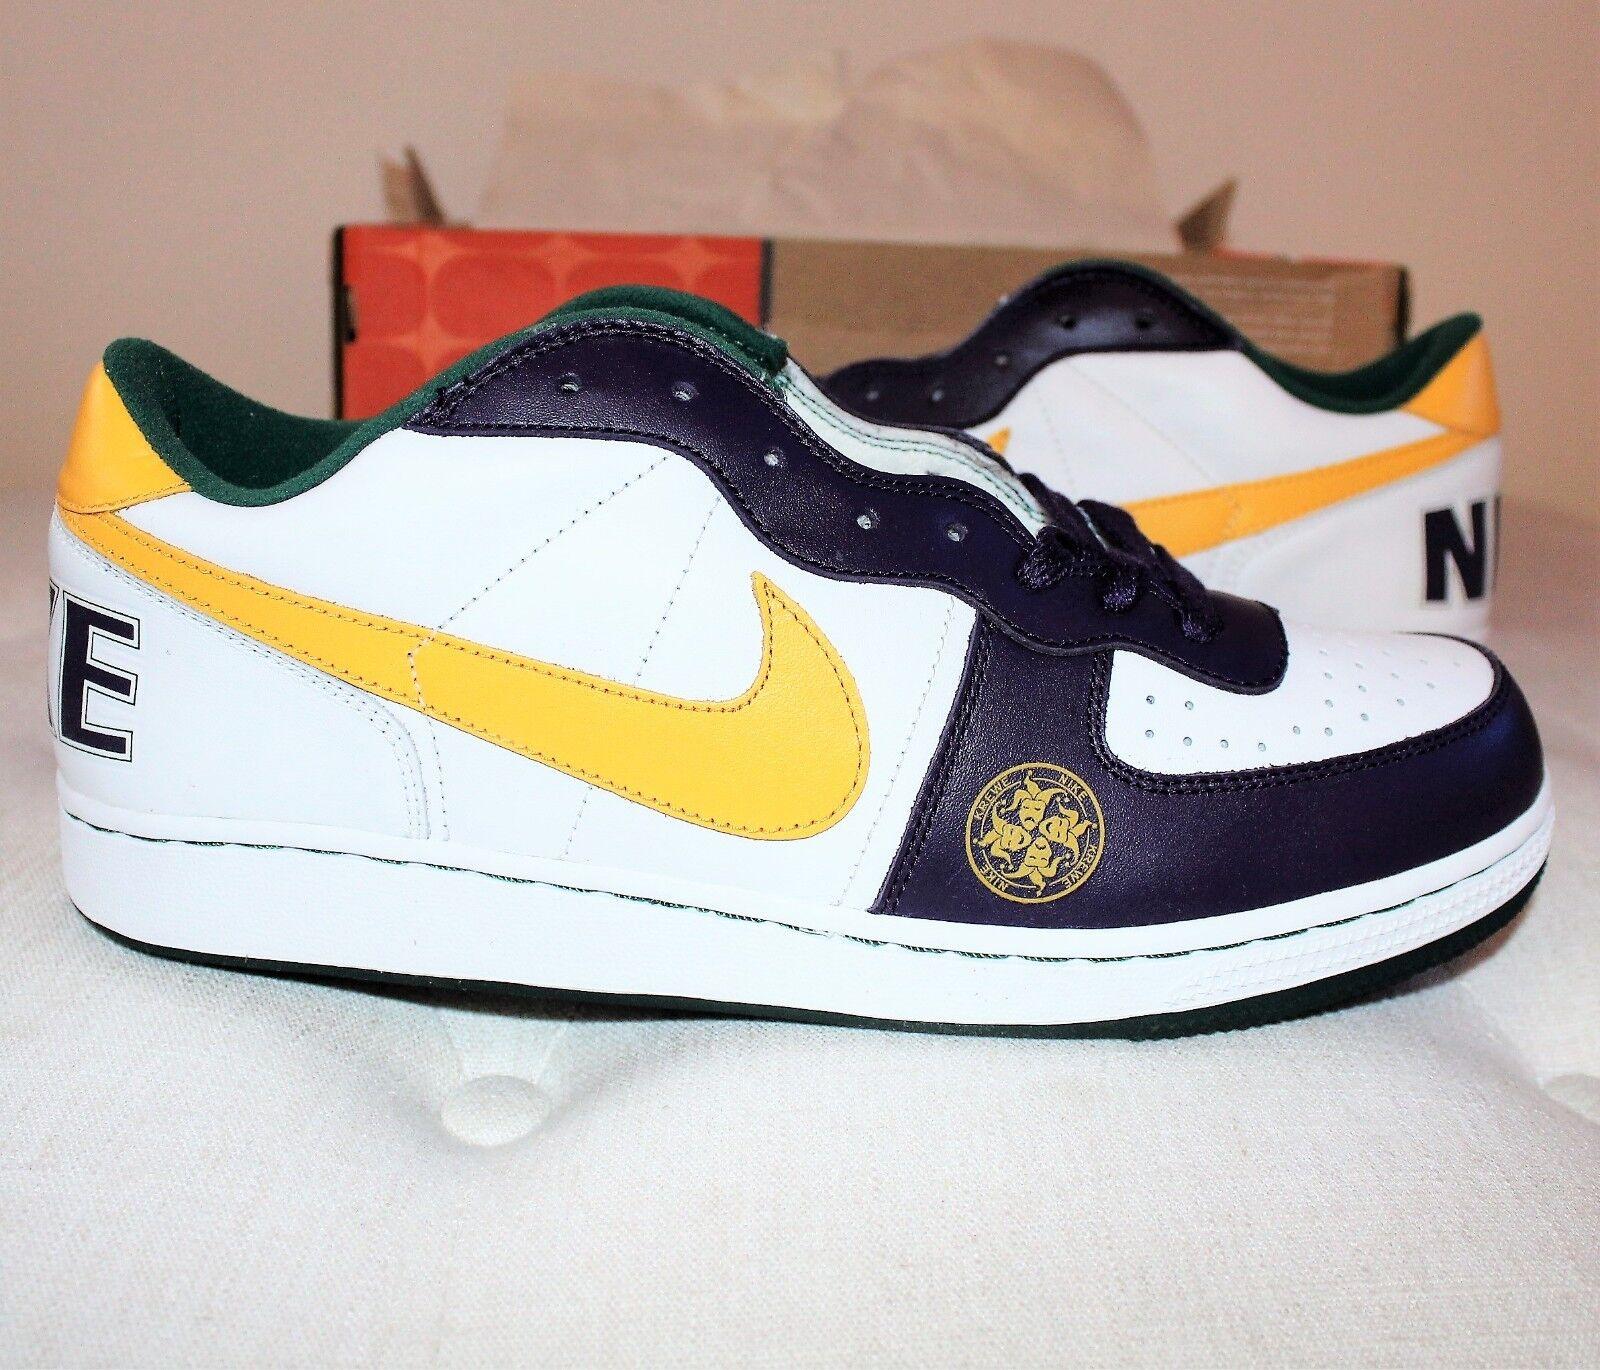 Nike Krewe Terminator Low White Yellow Purple Sz. 11.5 2005 [St]